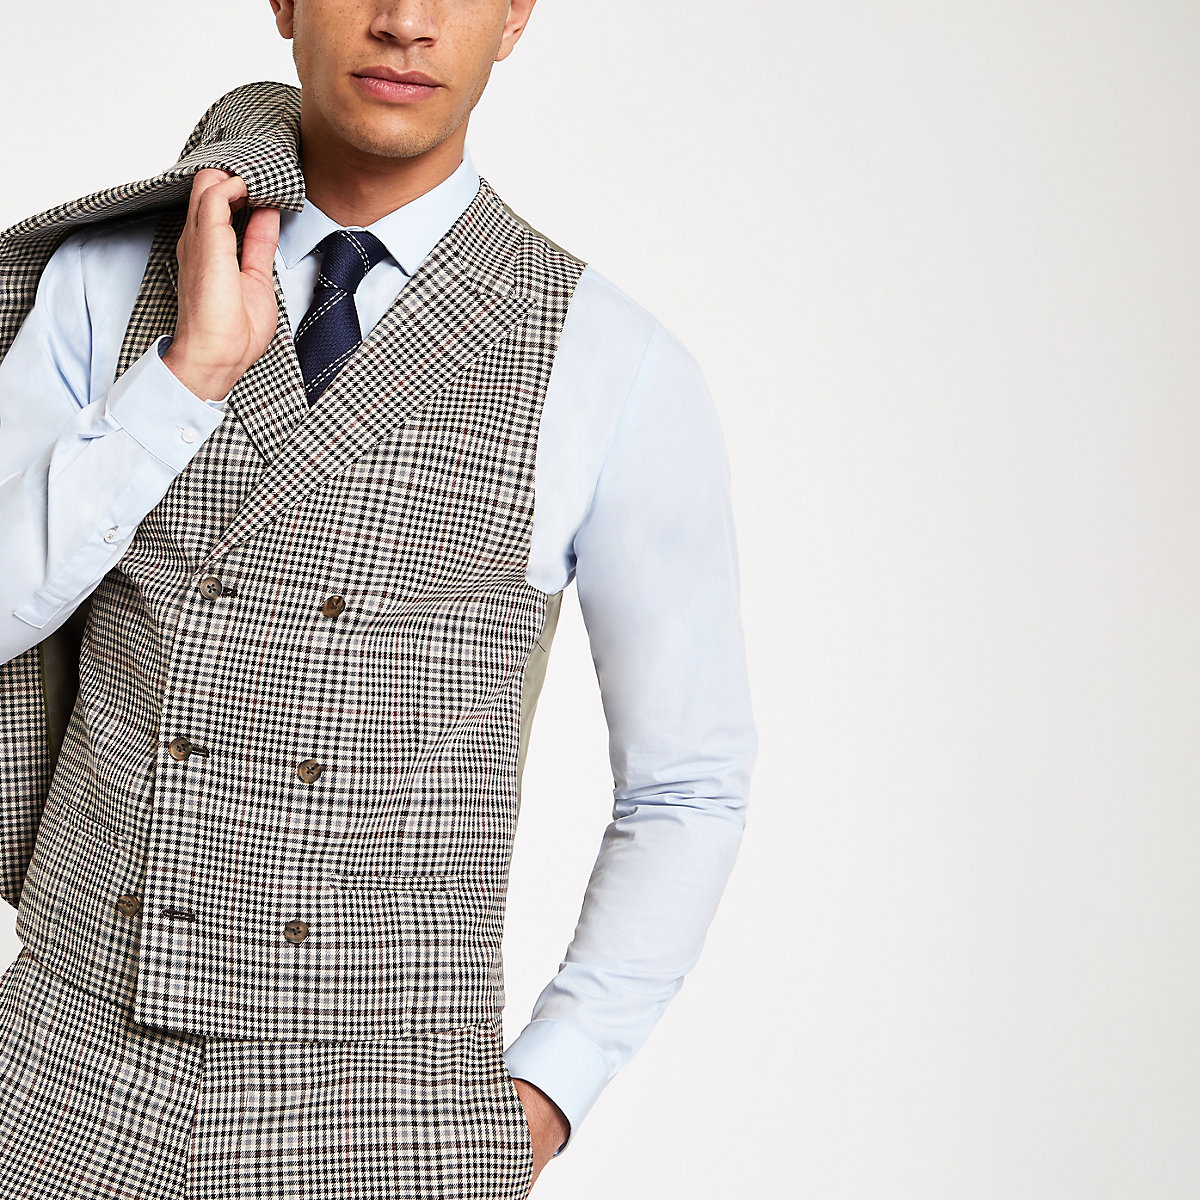 Brown heritage check suit vest